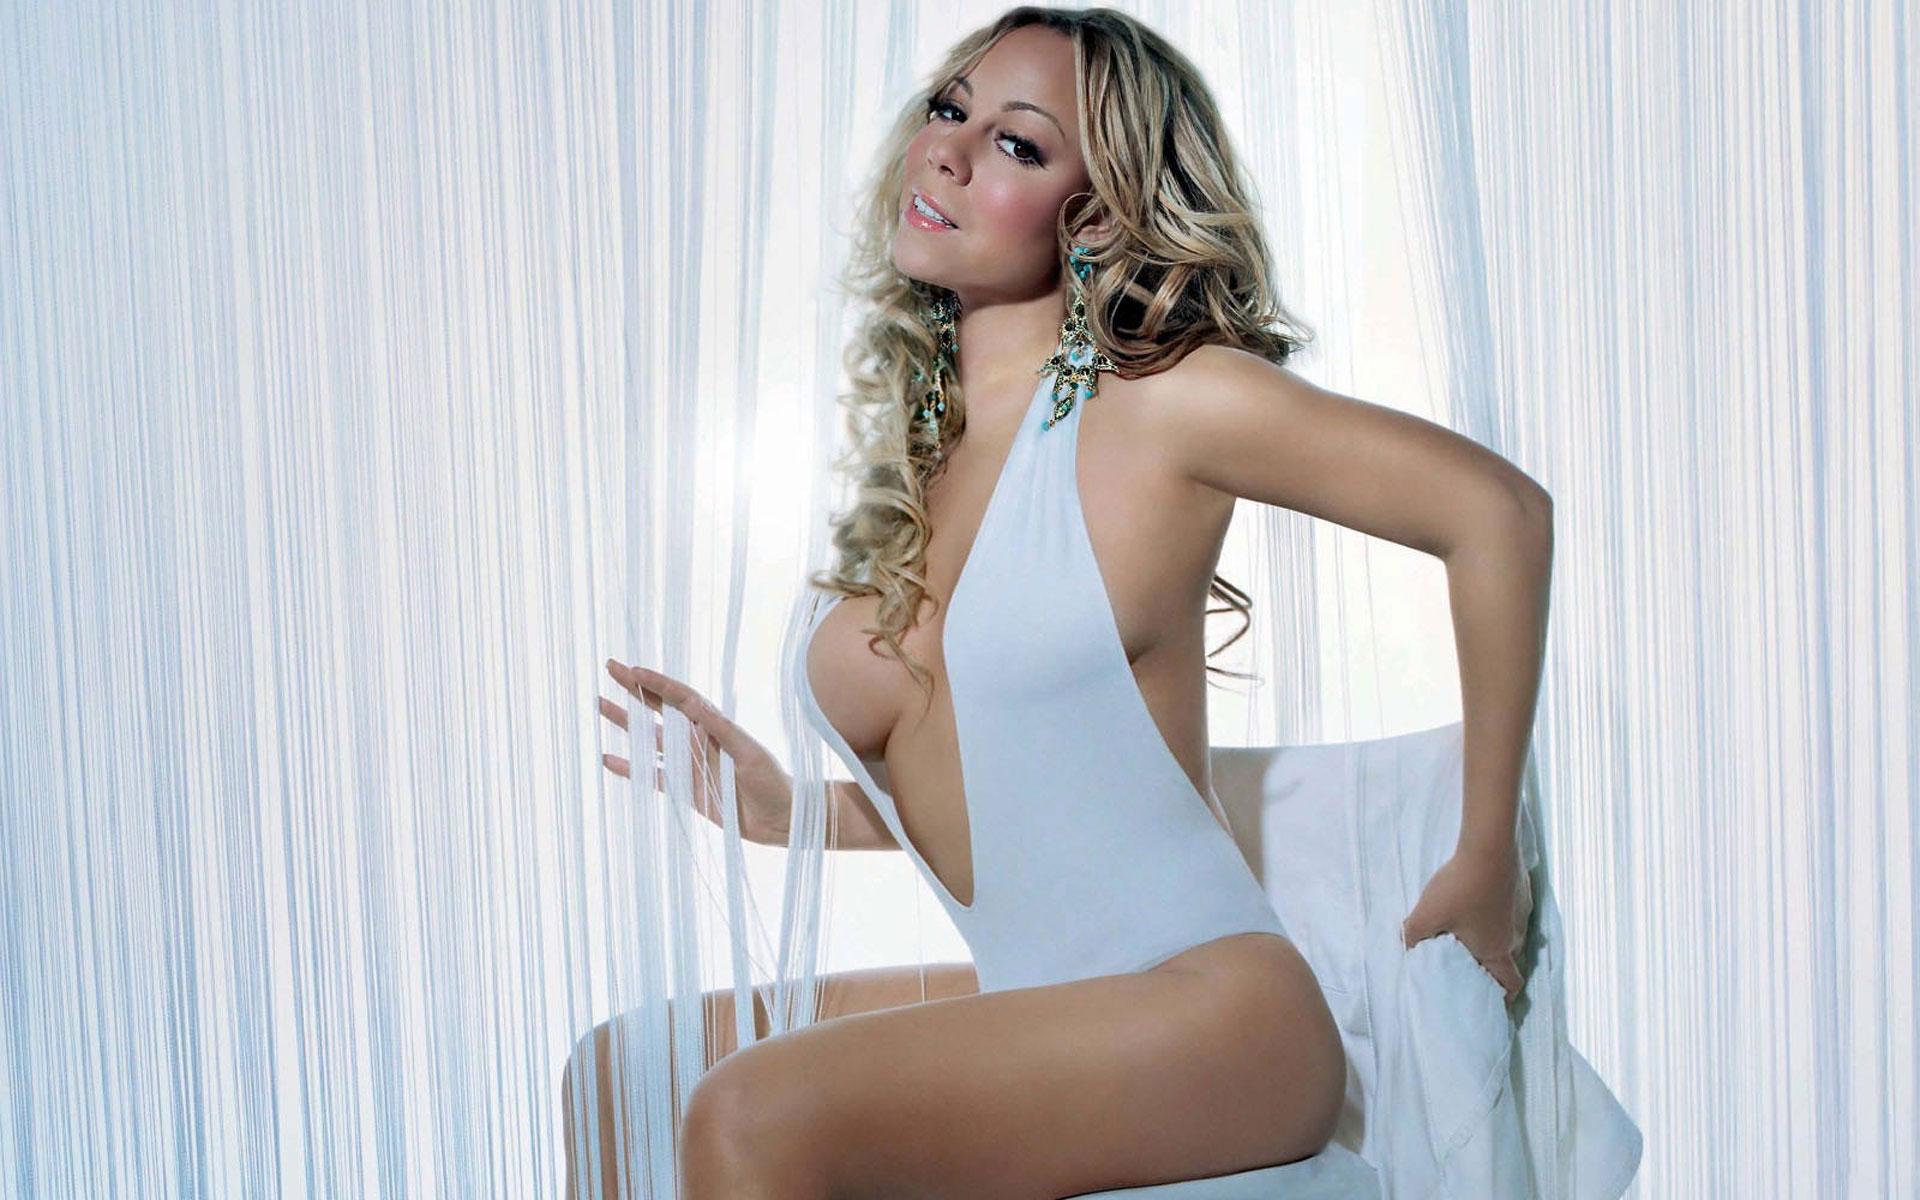 Mariah Carey queda semi desnuda tras